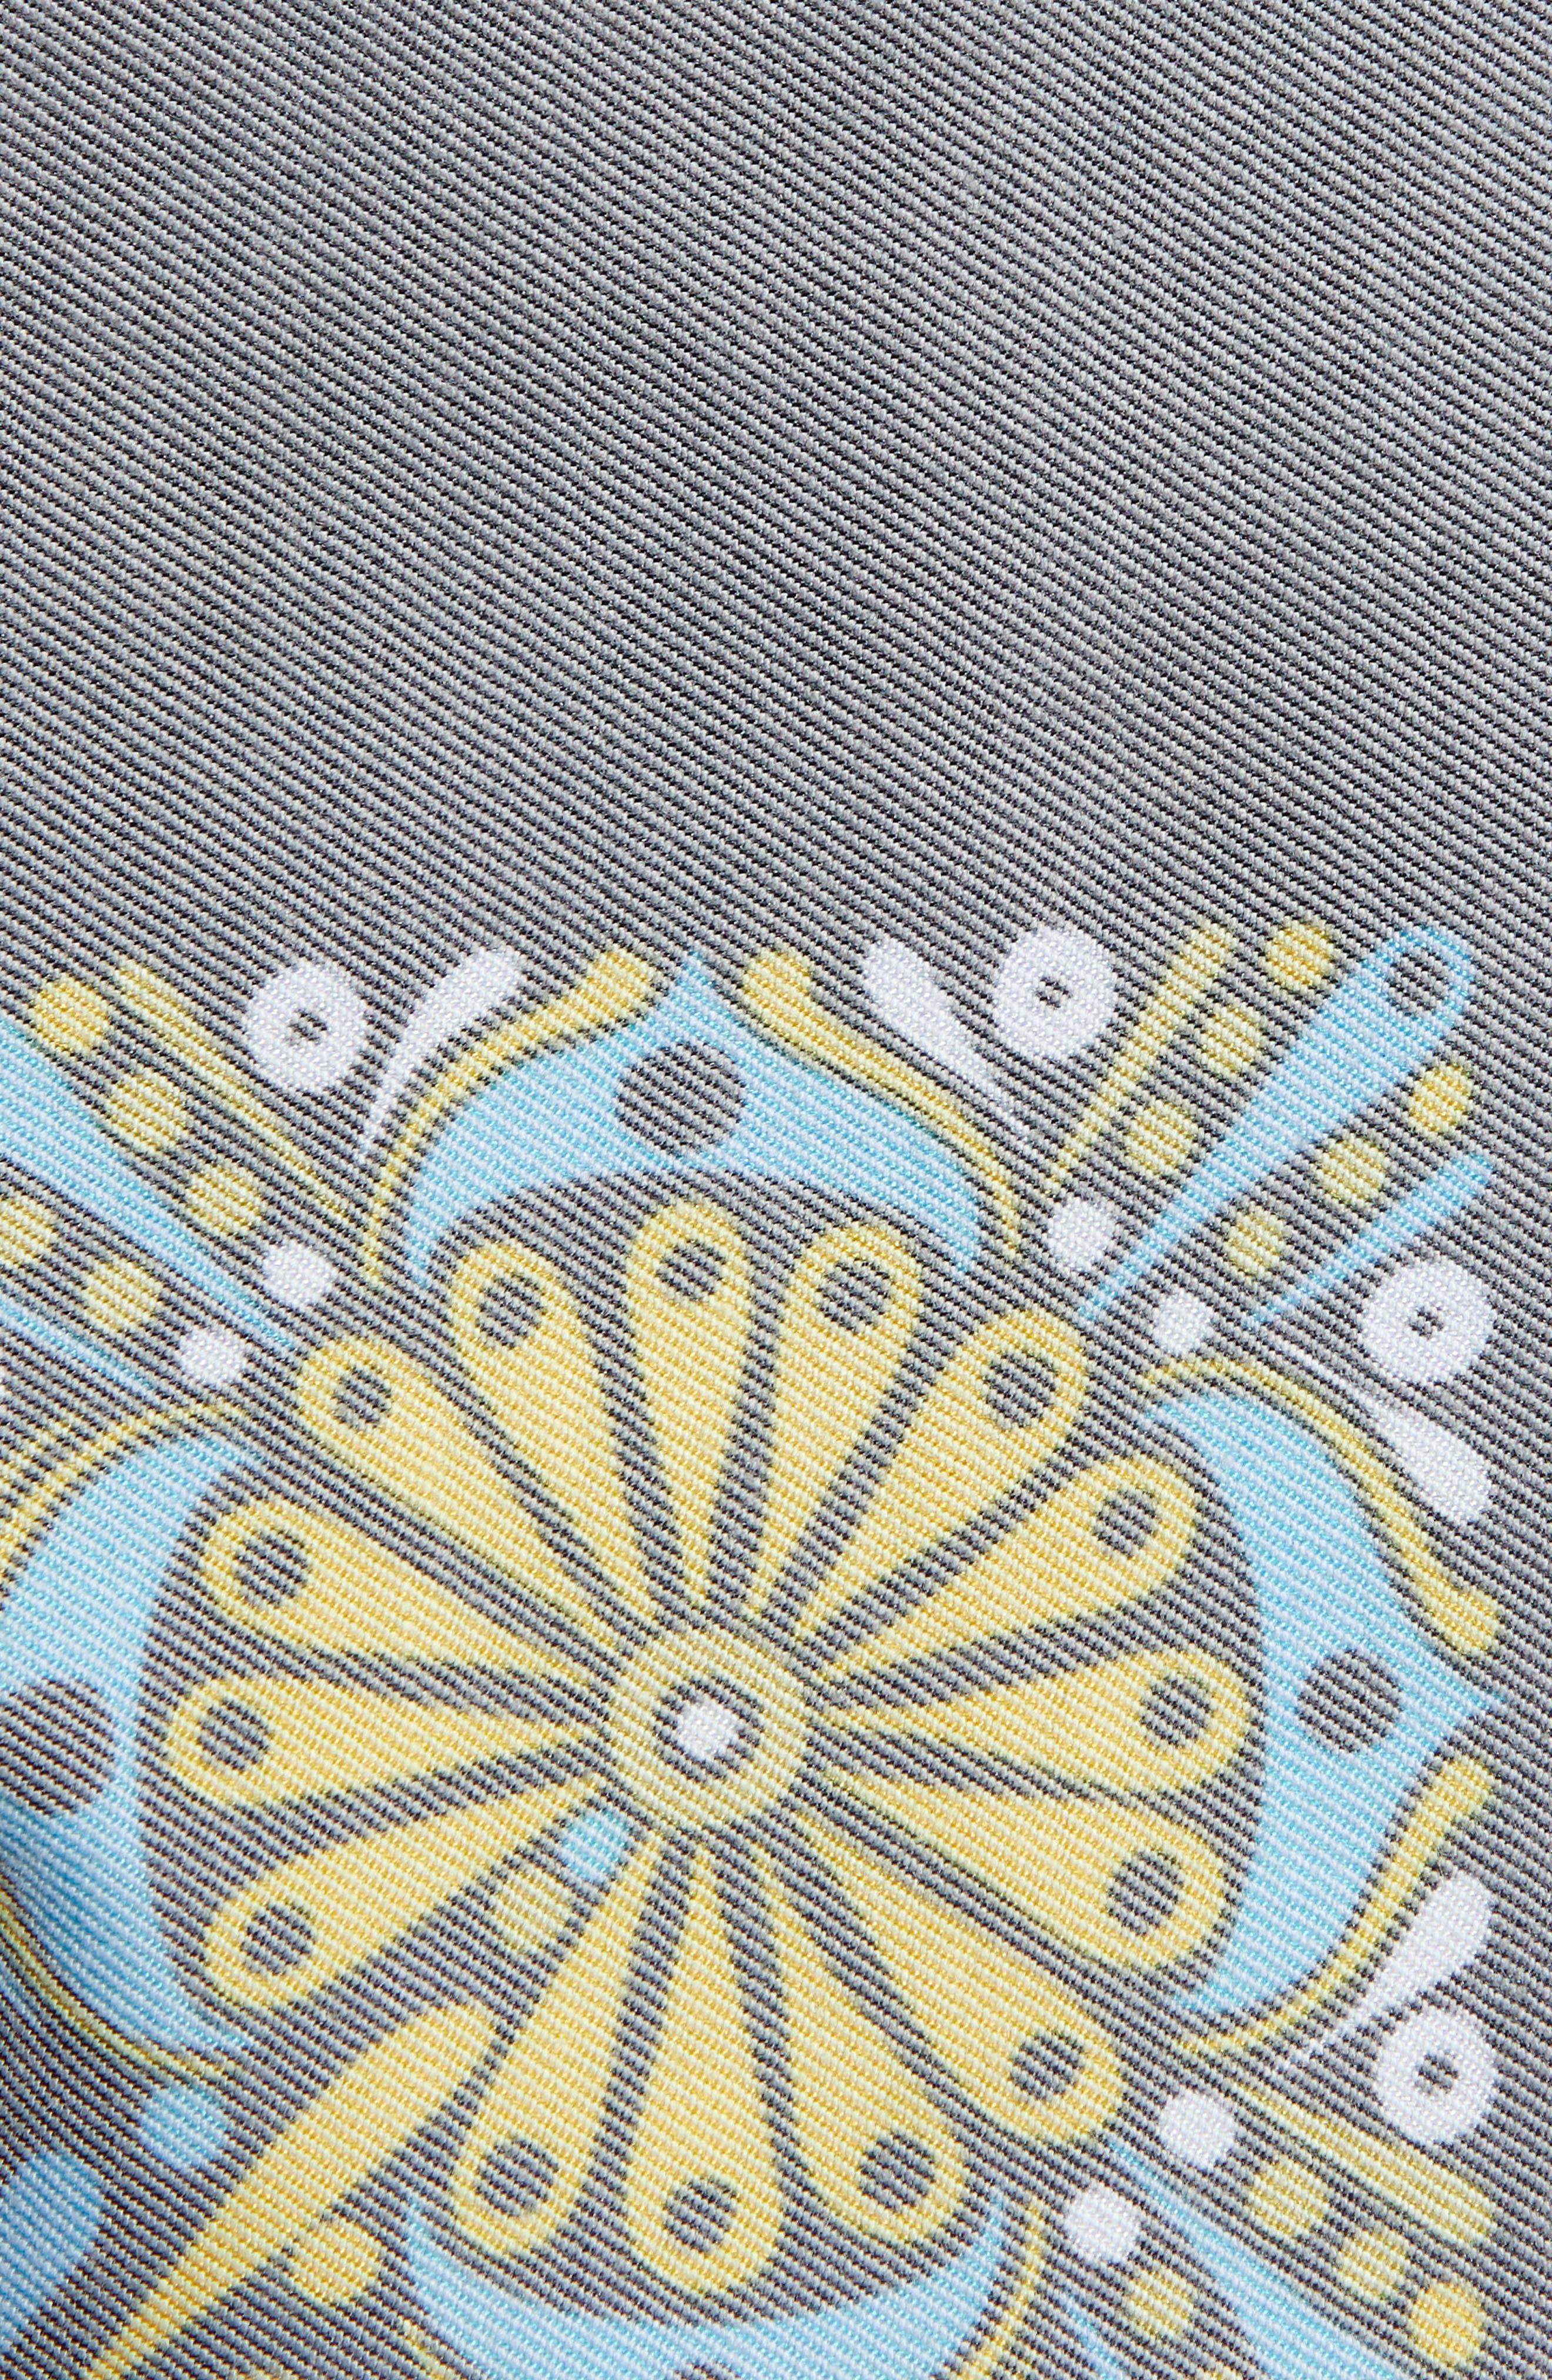 Phantom Block Party Hideaway Board Shorts,                             Alternate thumbnail 5, color,                             BLACK